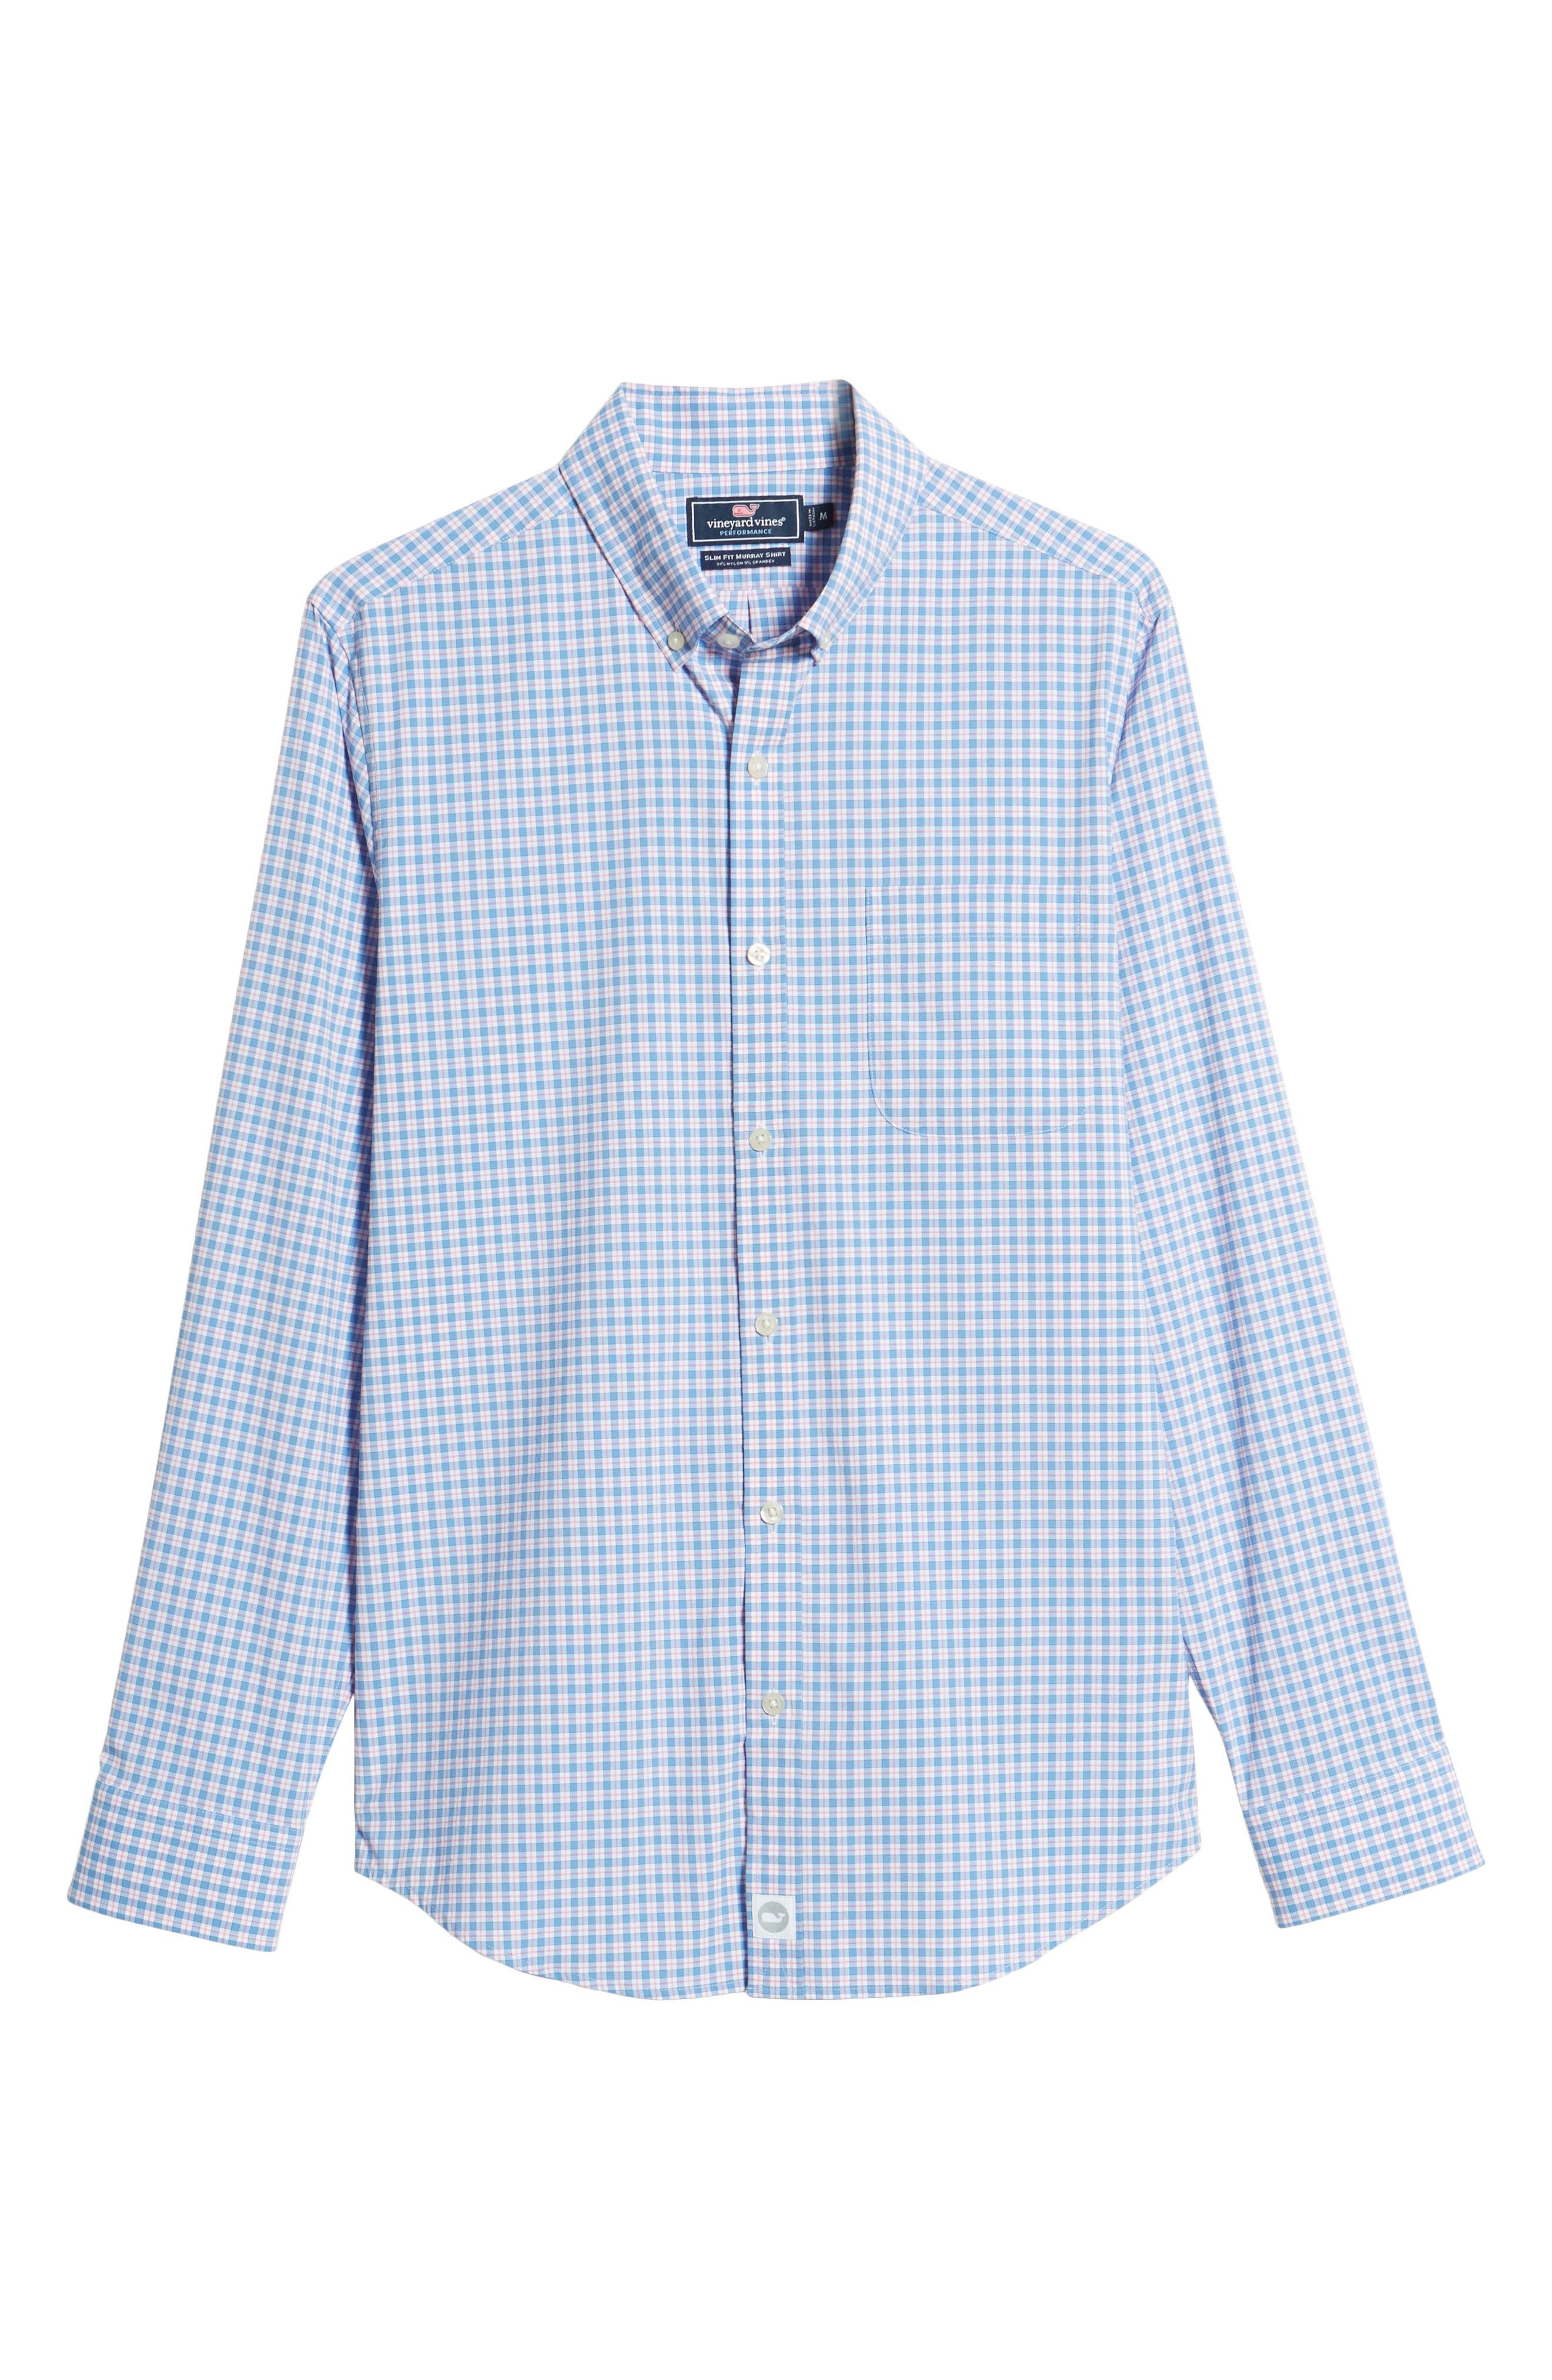 Oyster Pond Slim Fit Plaid Sport Shirt,                             Alternate thumbnail 6, color,                             OCEAN BREEZE